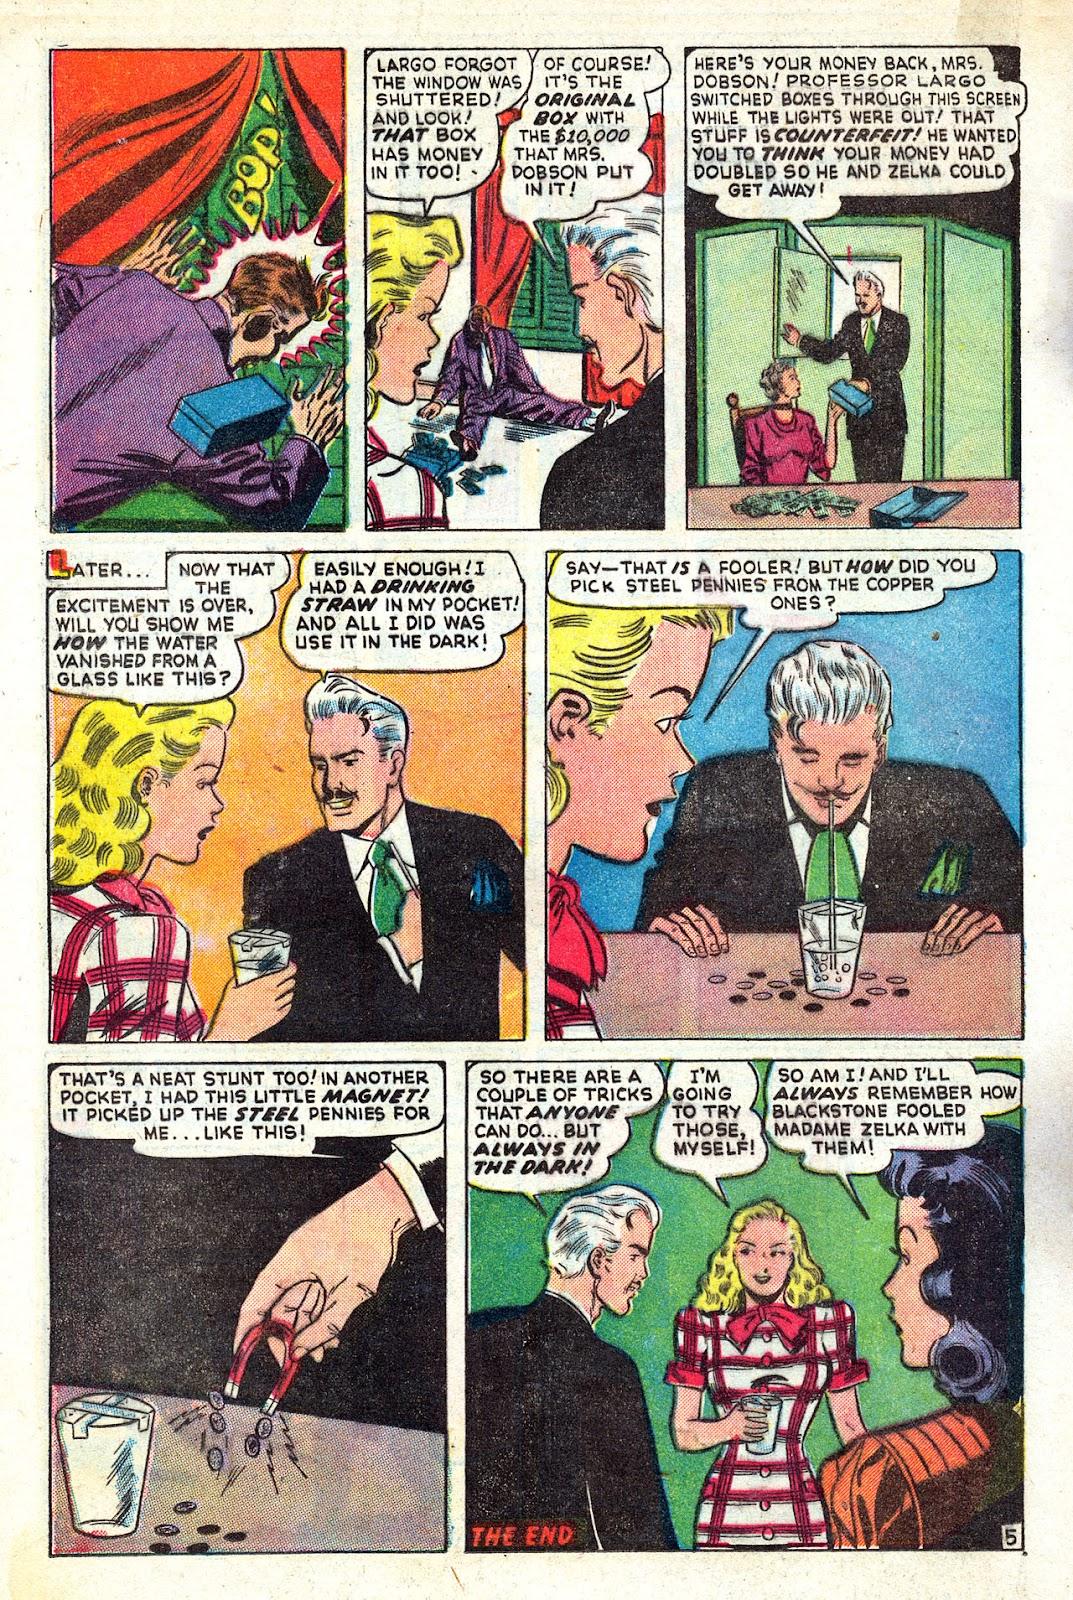 Read online Blackstone the Magician comic -  Issue #4 - 16